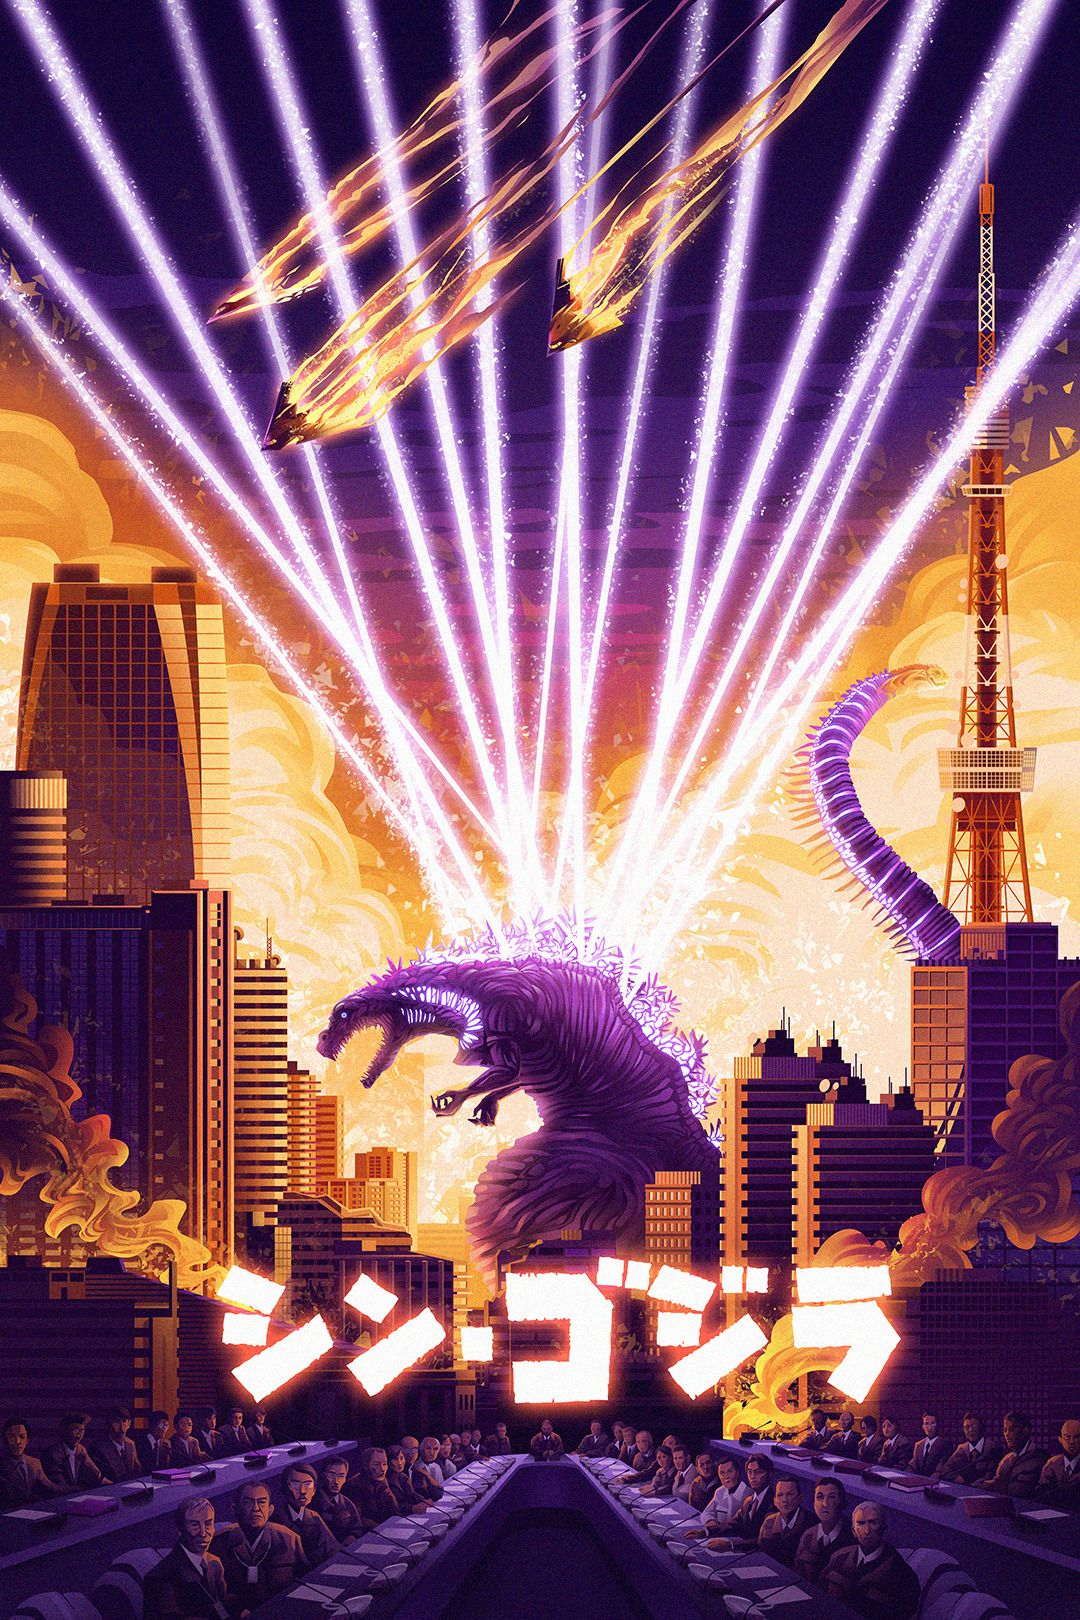 francoyovich: Shin Godzilla (シンゴジラ) Shin Godzilla was ...